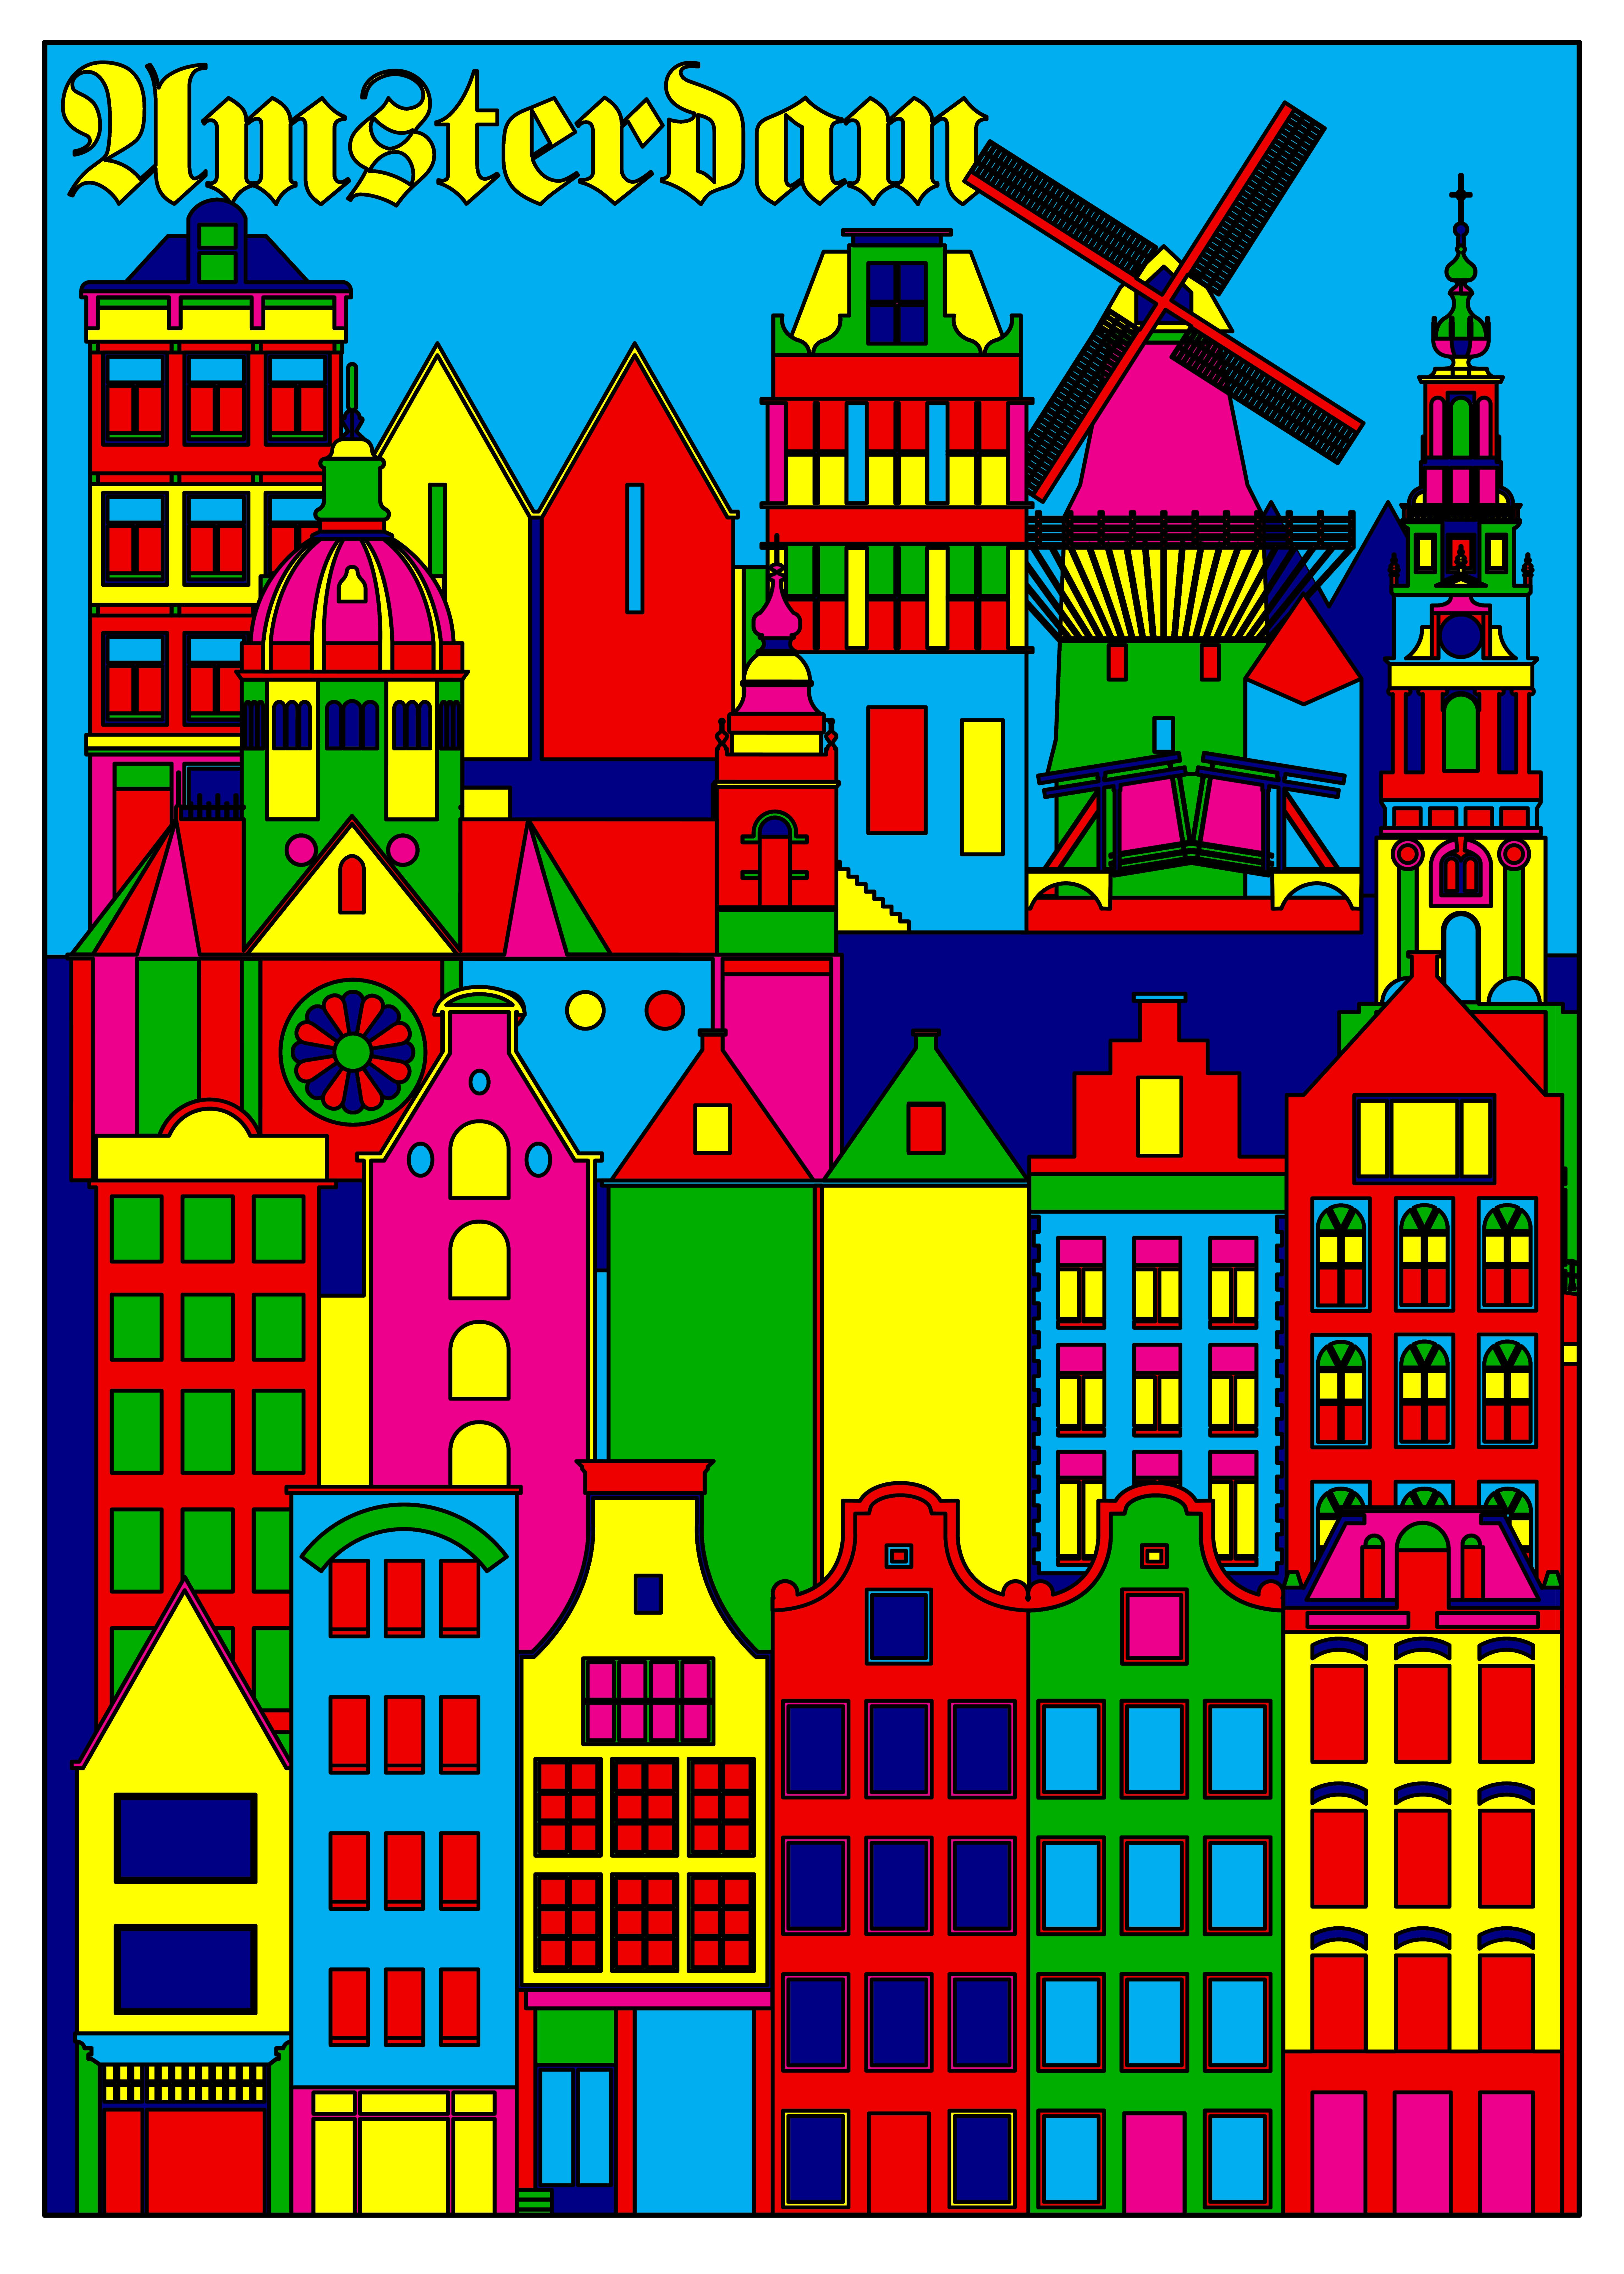 Steven WILSON_Amsterdam_Screen Print_Ed.10_70x50cm_2018_120만원